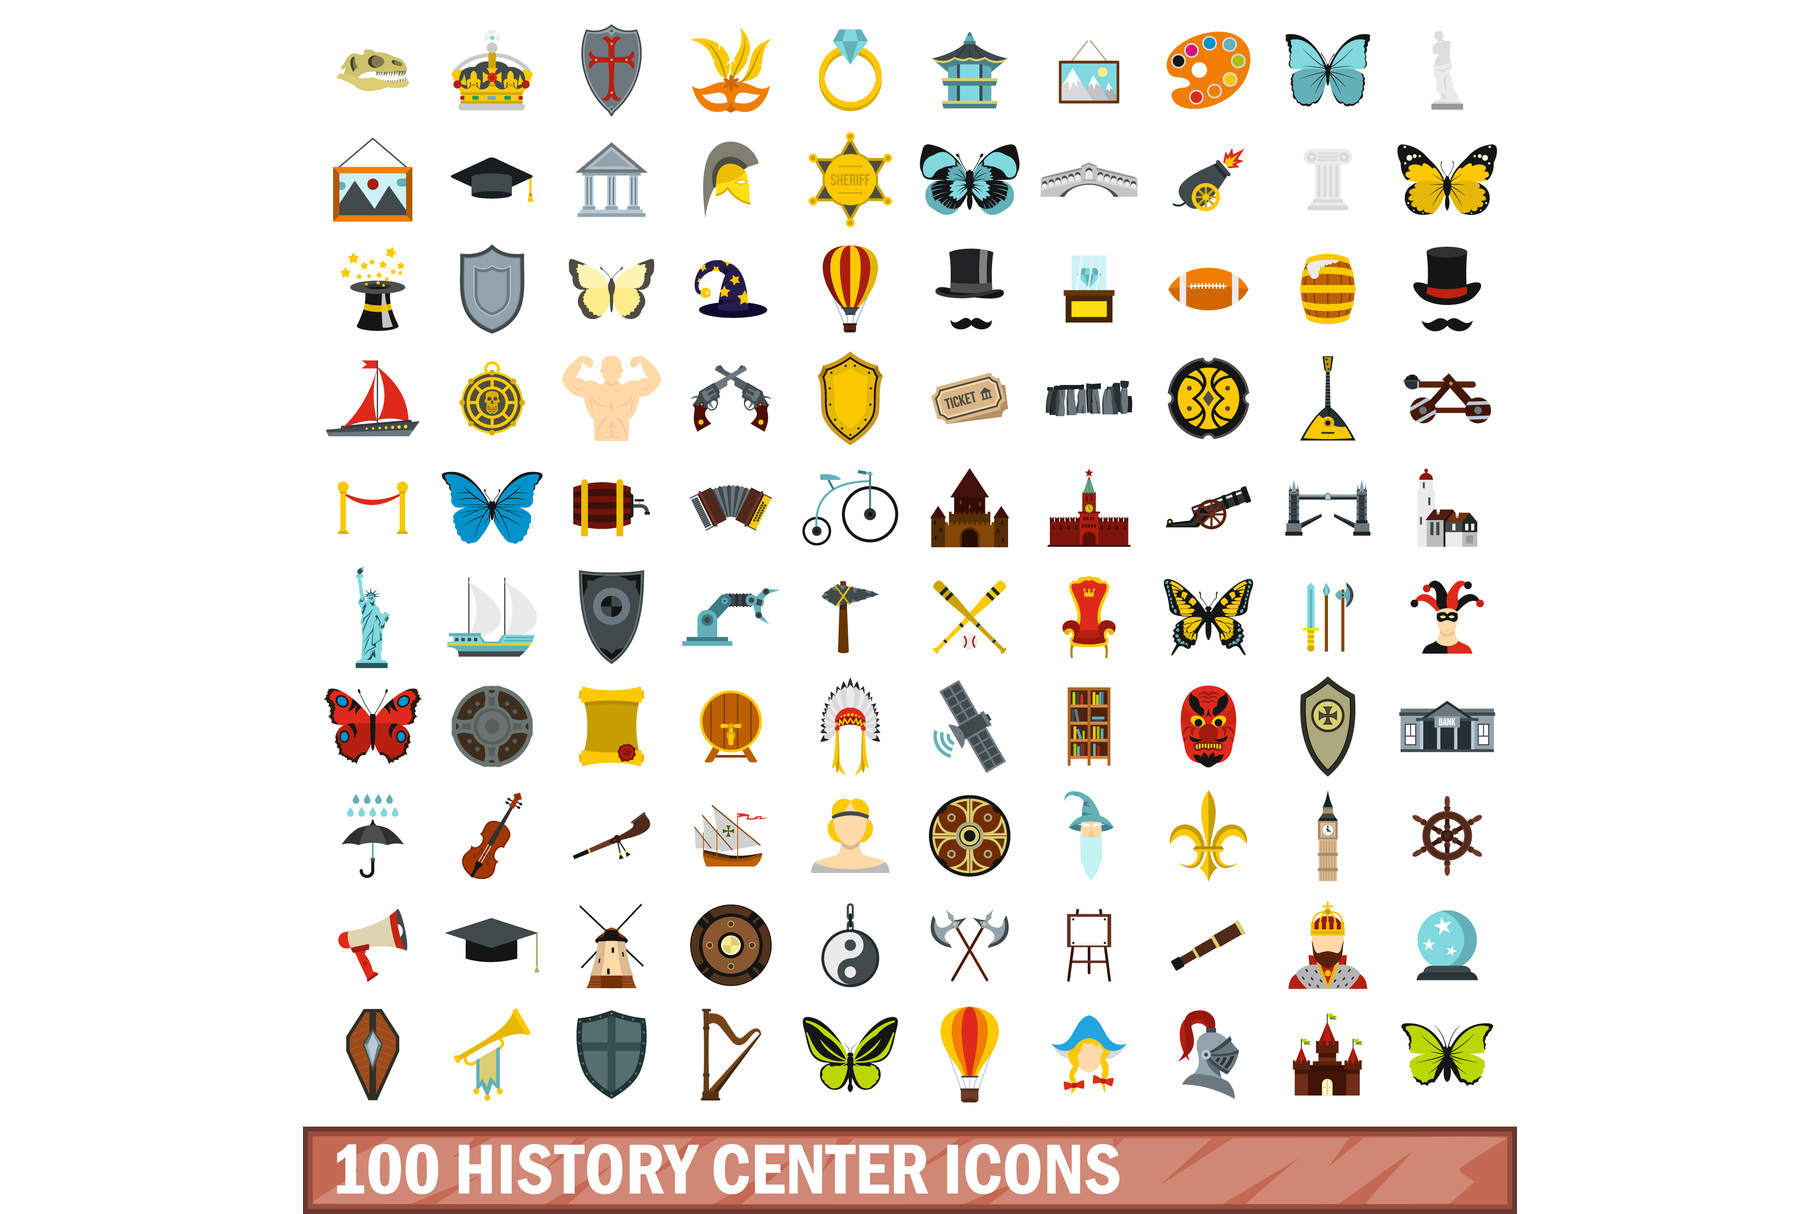 100 history center icons set, flat style example image 1